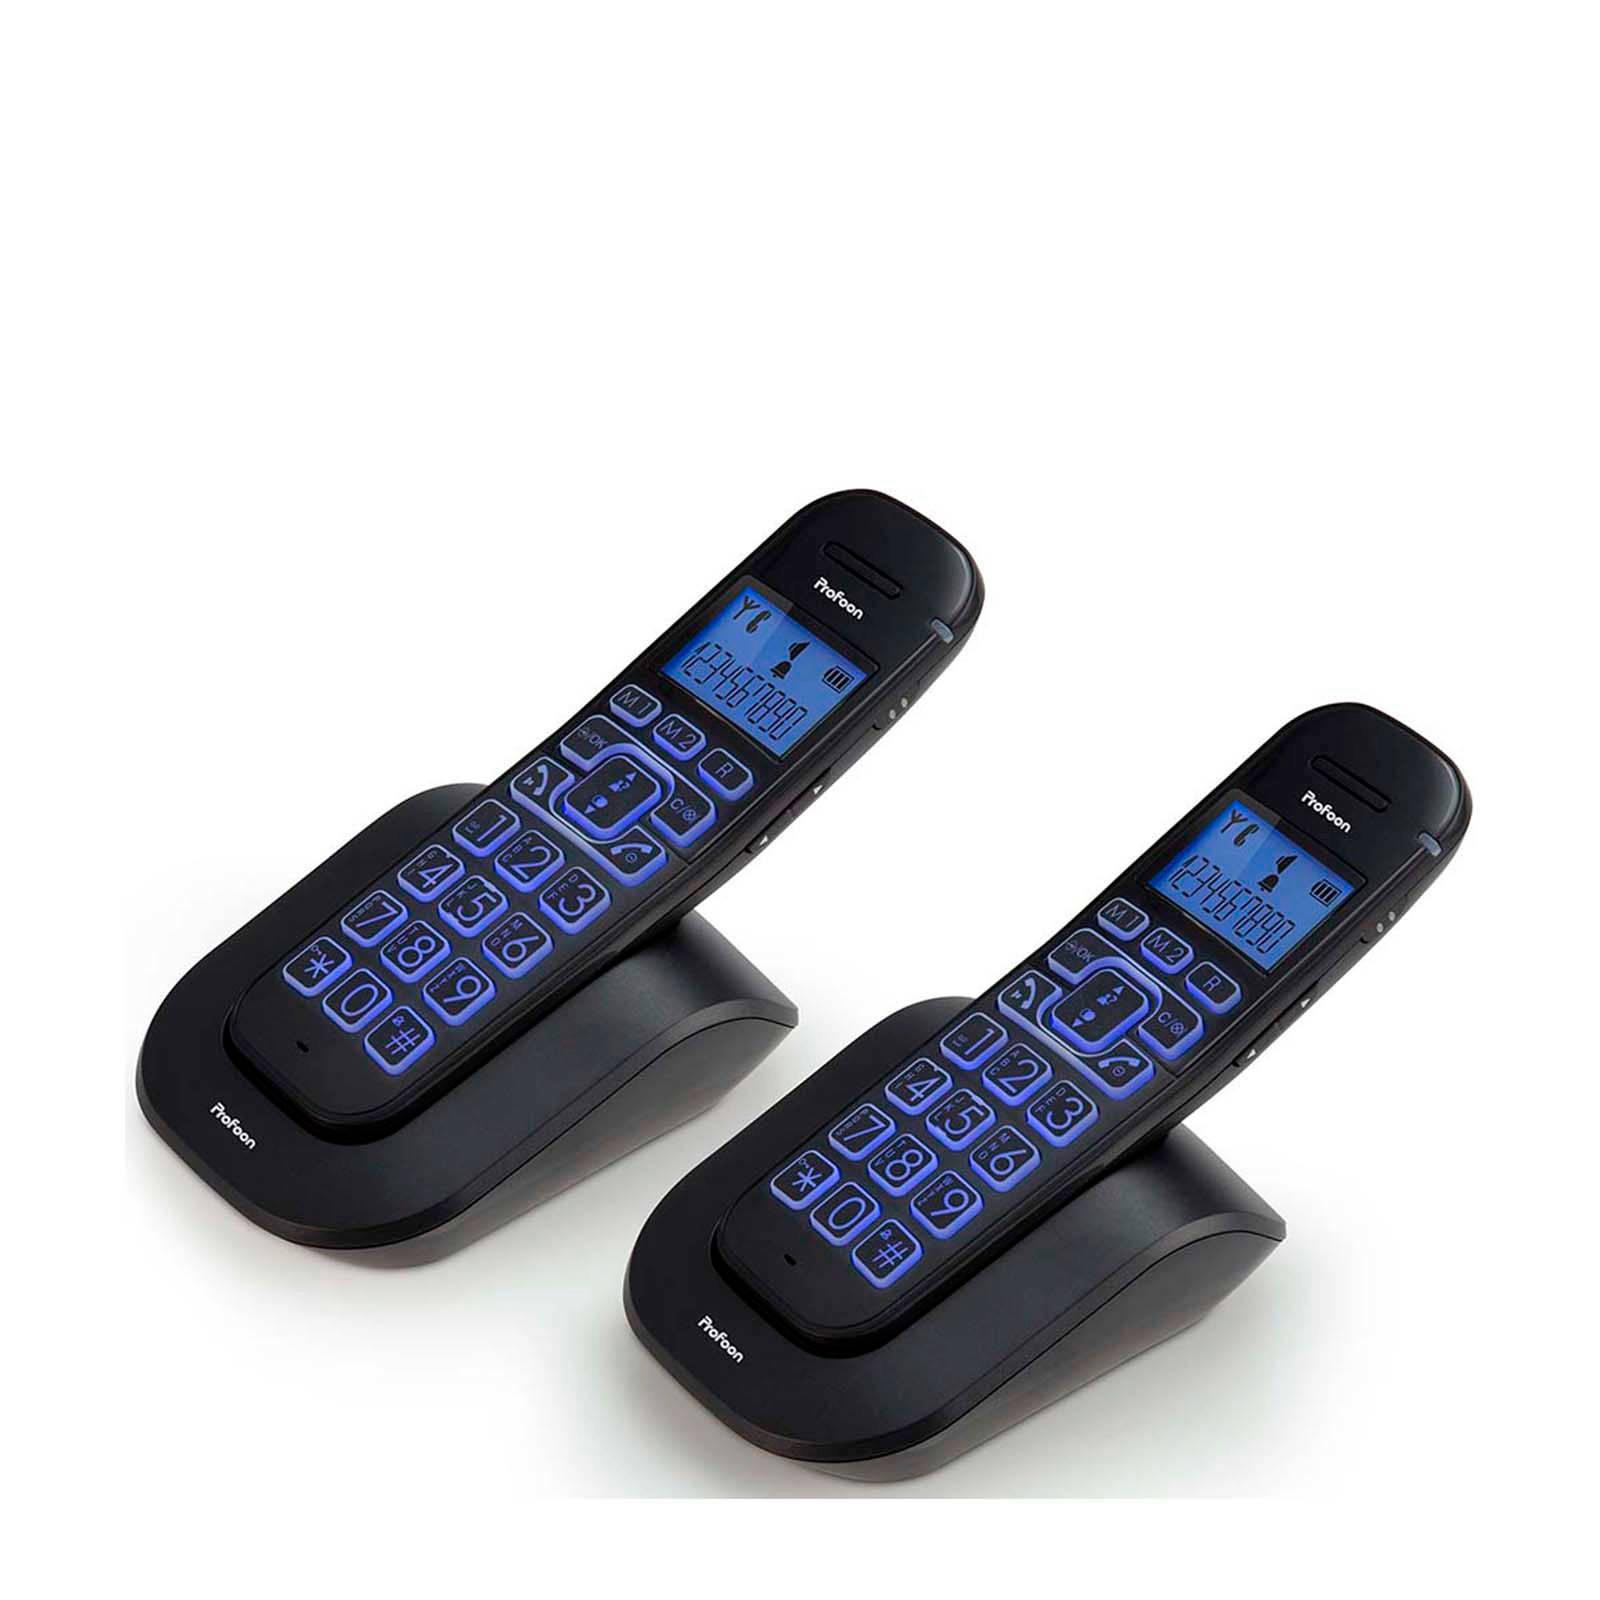 Profoon PDX-2808 DUO Big button DECT telefoon voor €35,45 @ Bol.com Plaza